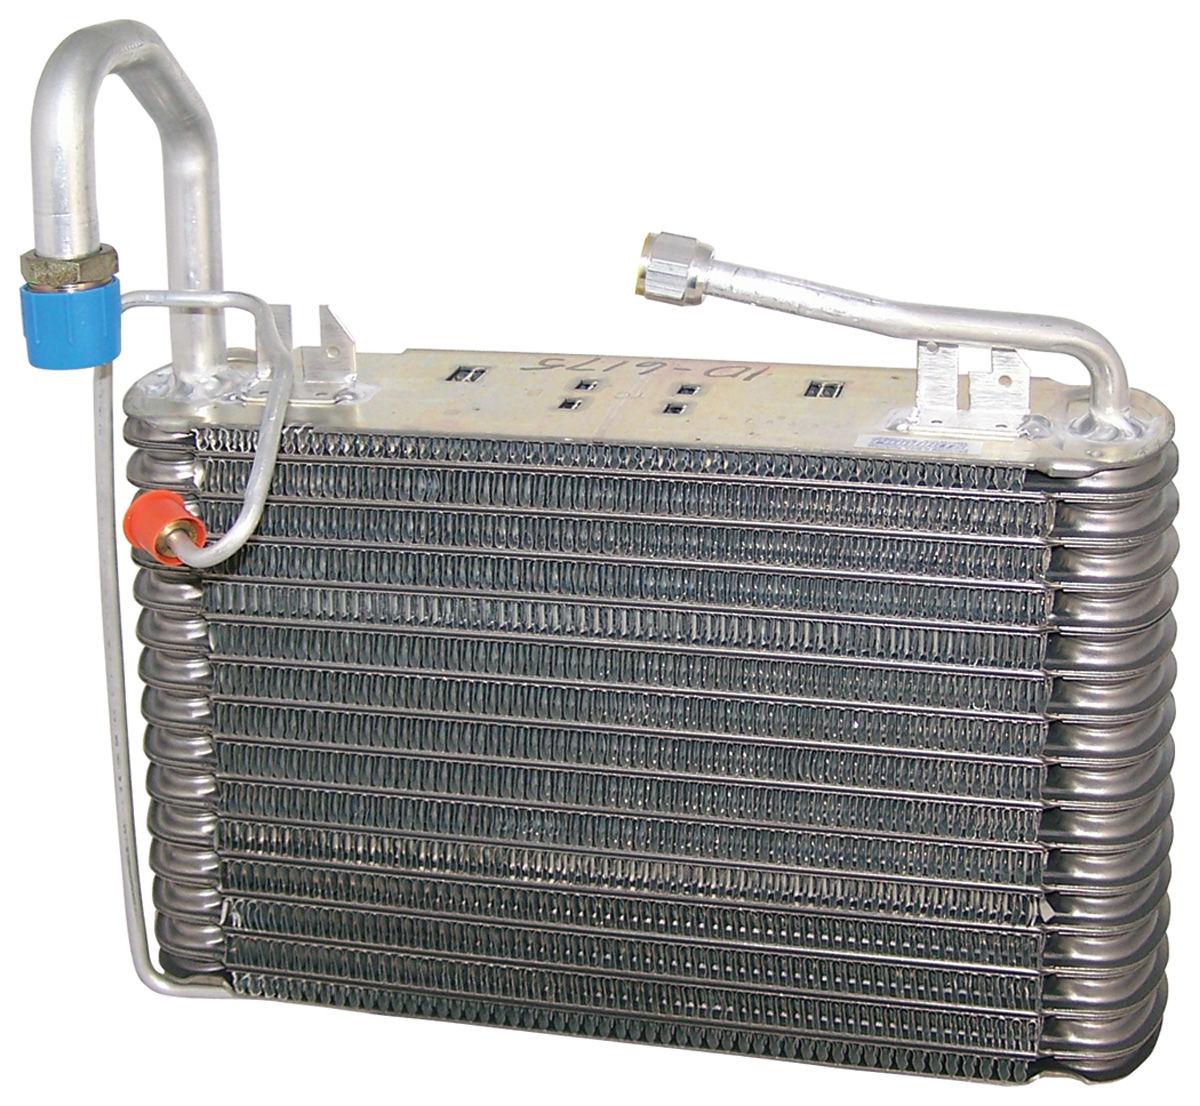 AC Evaporator, 1966 Bonn/Cat, w/EA-5066B Markings